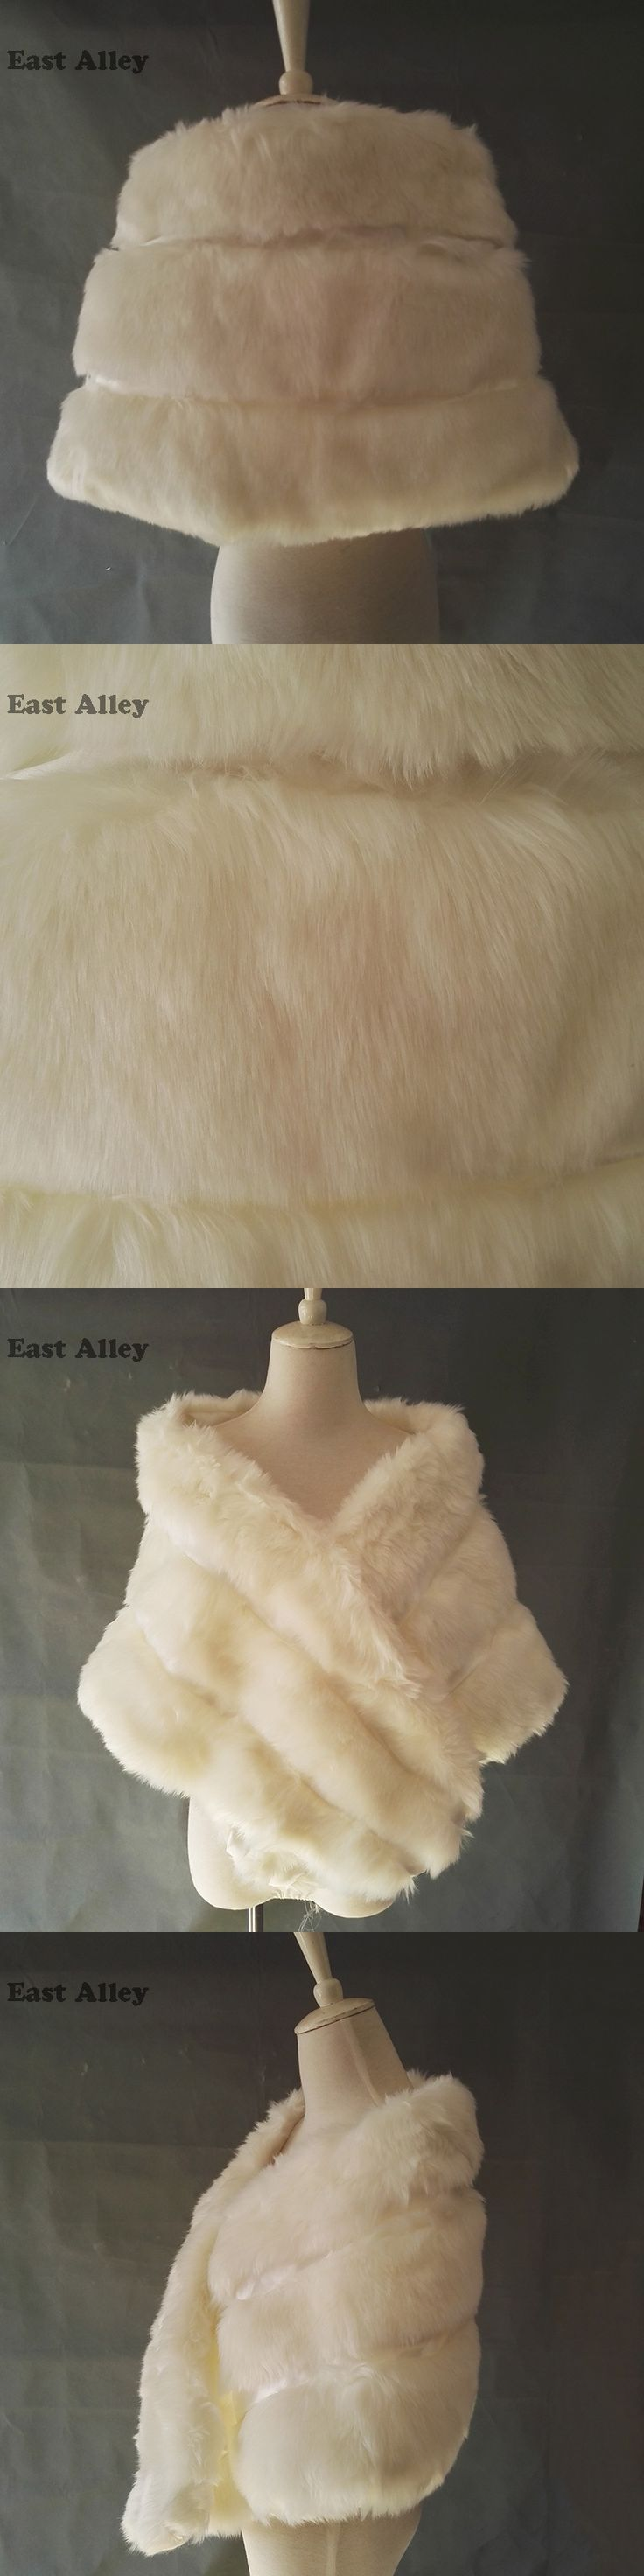 New Grey Pink Ivory Women's Bridal Wedding Faux Fur Shawl Cape Stole Wrap Shrug Coat